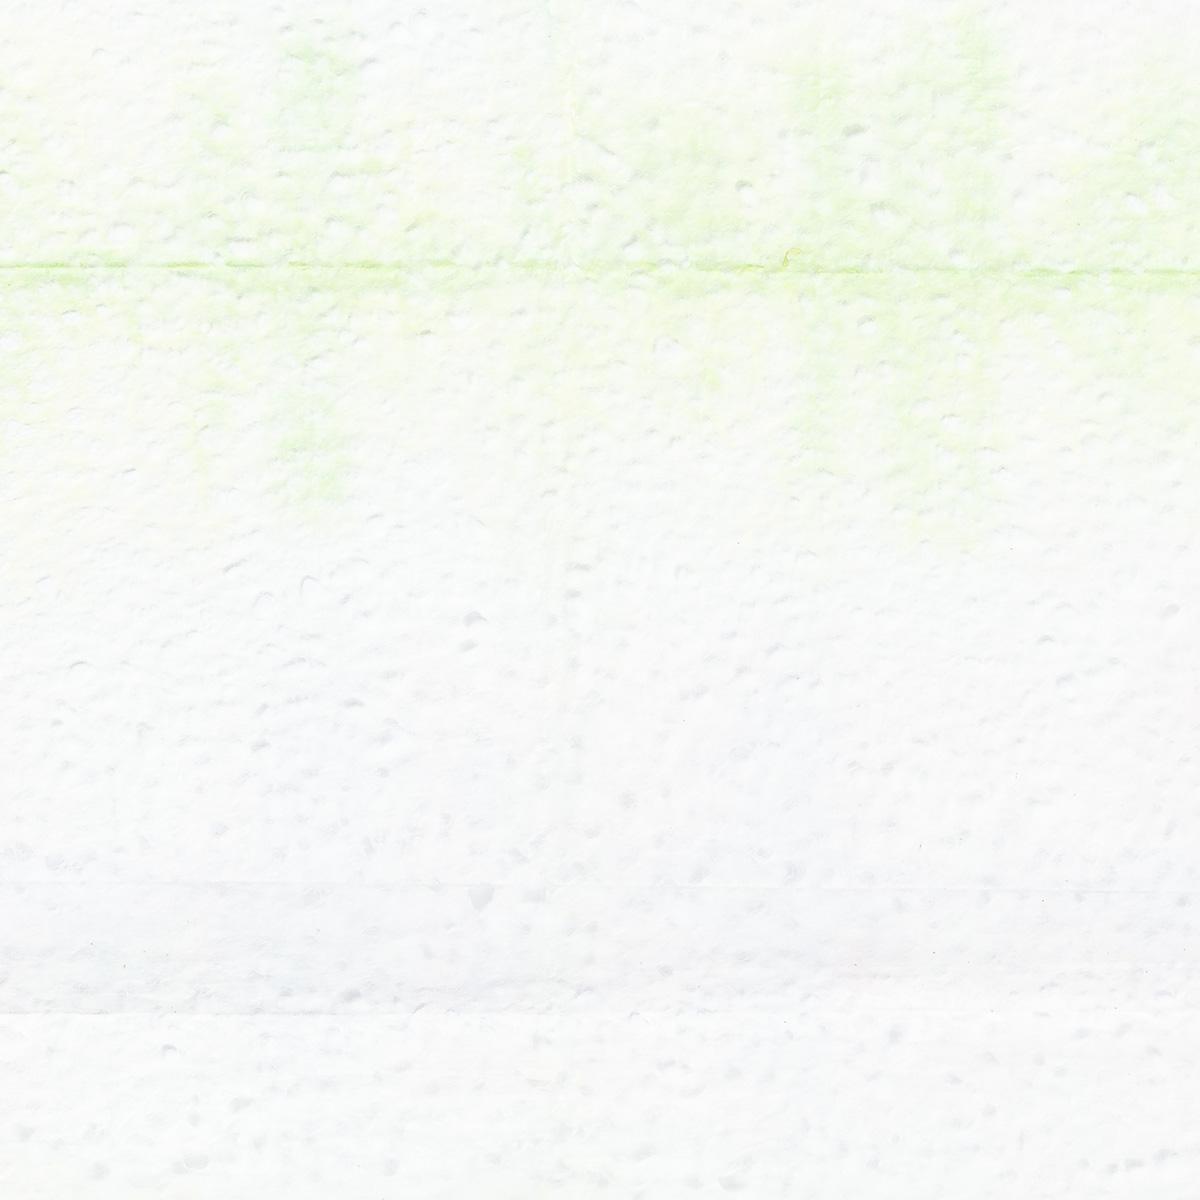 落水紙(春雨)板締め No.15